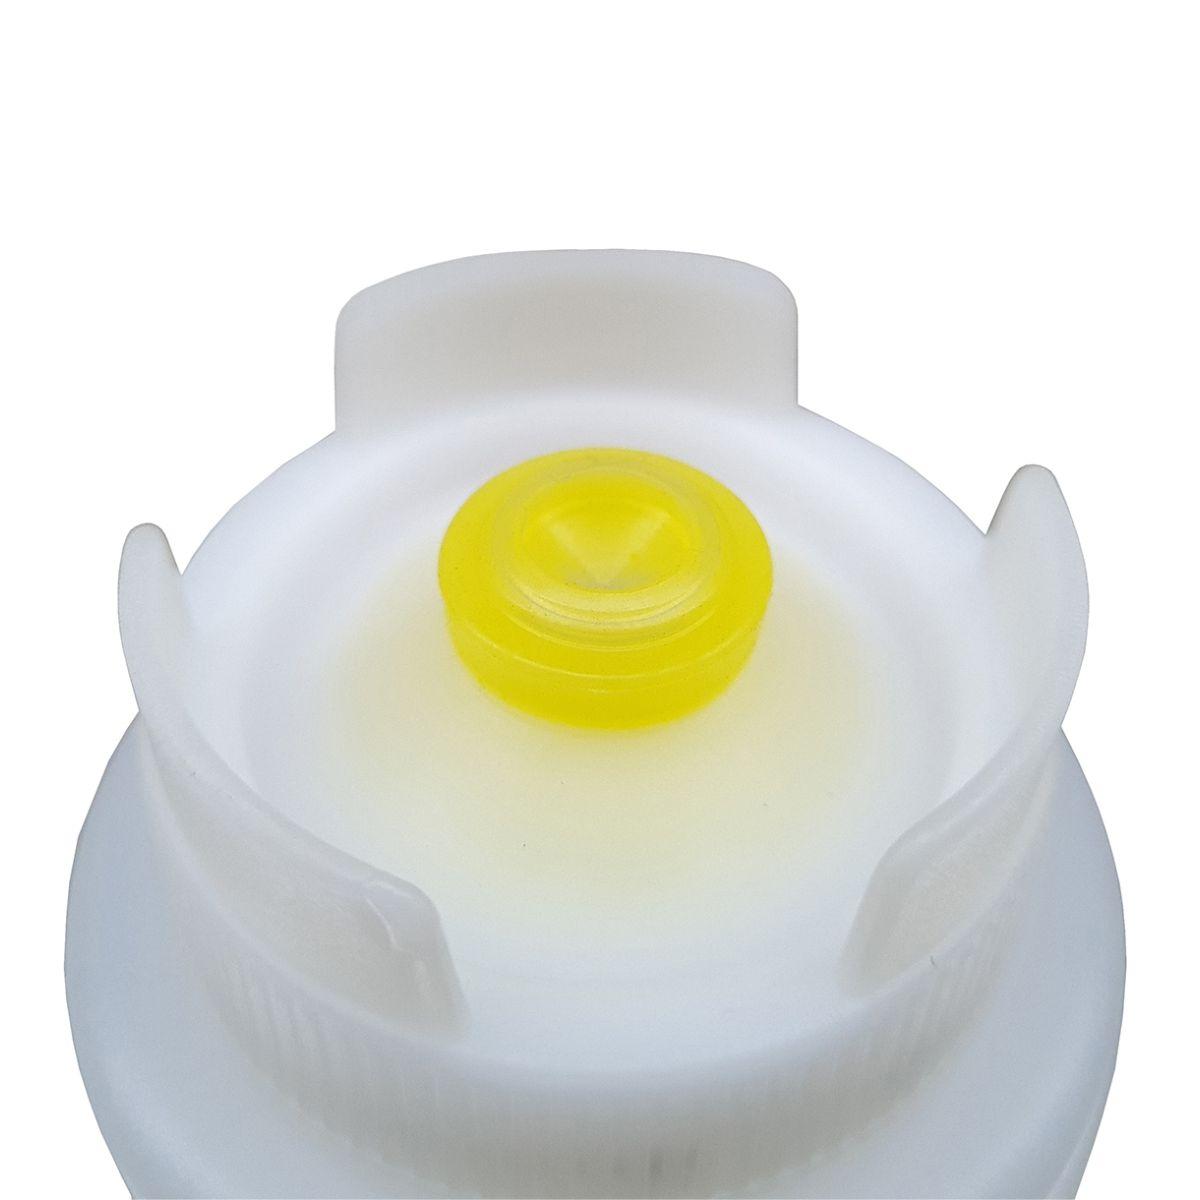 3 Bisnaga Invertida FIFO 720ml Yellow Gourmet  - EKENOX- Equipamentos Industriais